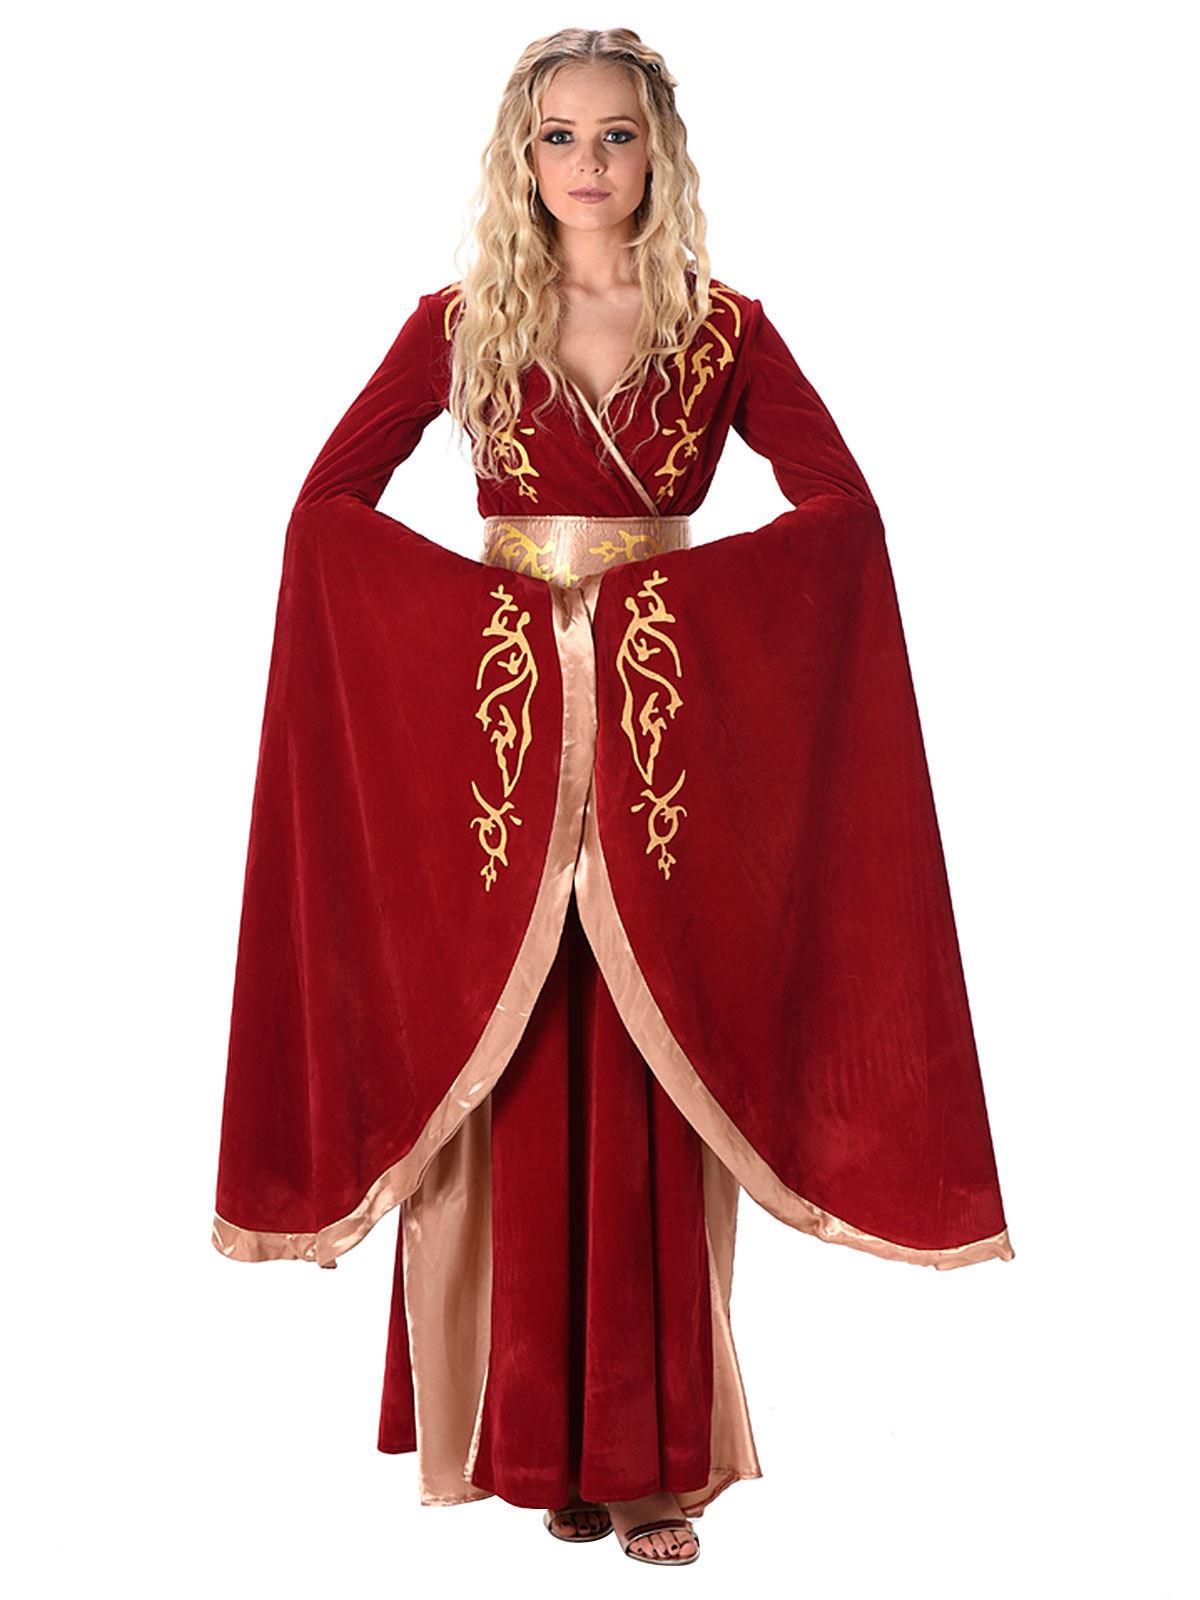 Deguisement-reine-medievale-rouge-et-or-femme-Cod-303413